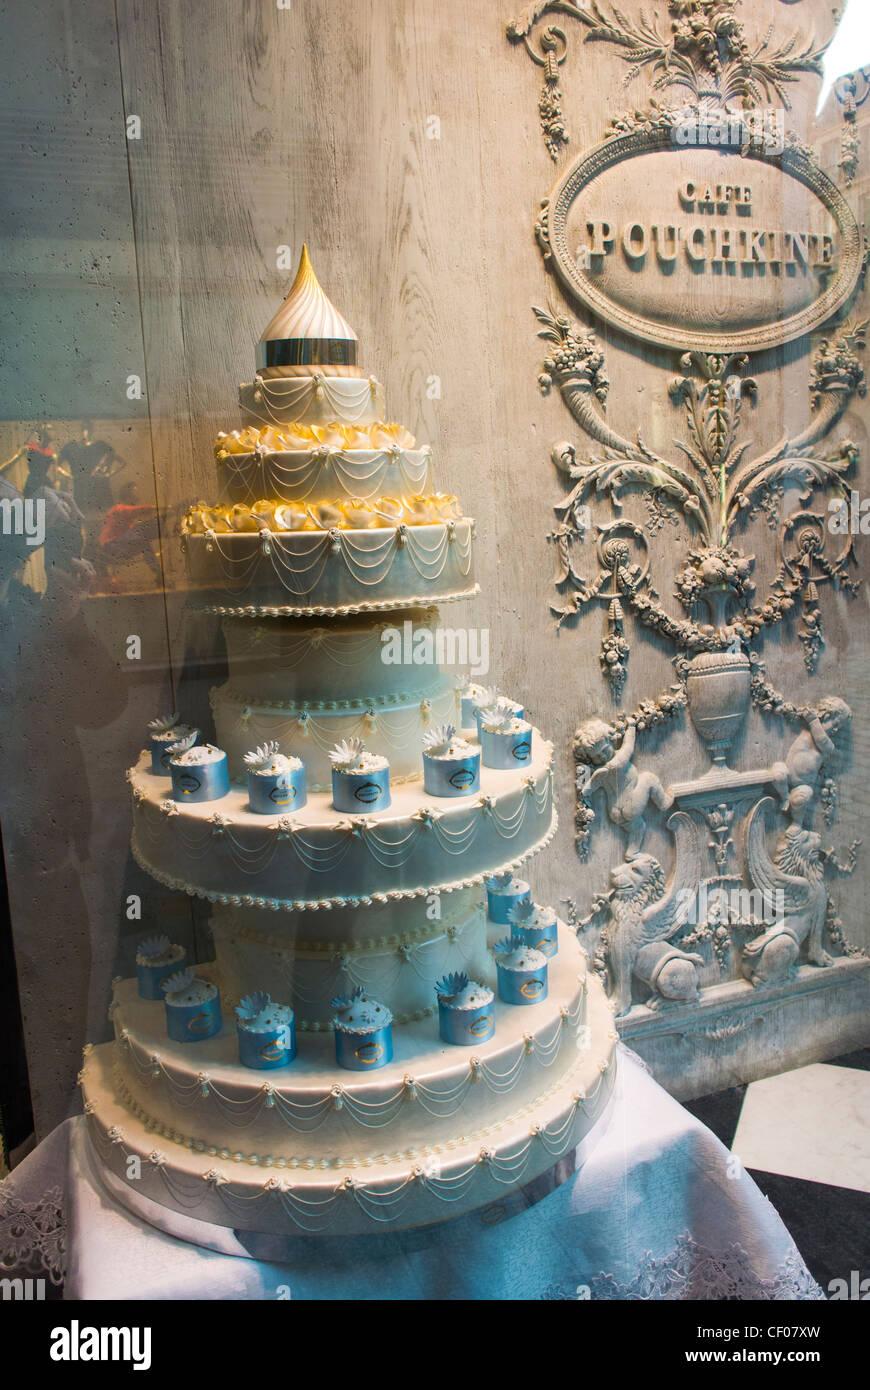 Paris France Shop Front Window Display Wedding Cake At Cafe Pouchkine Printemps Department Store Patisserie